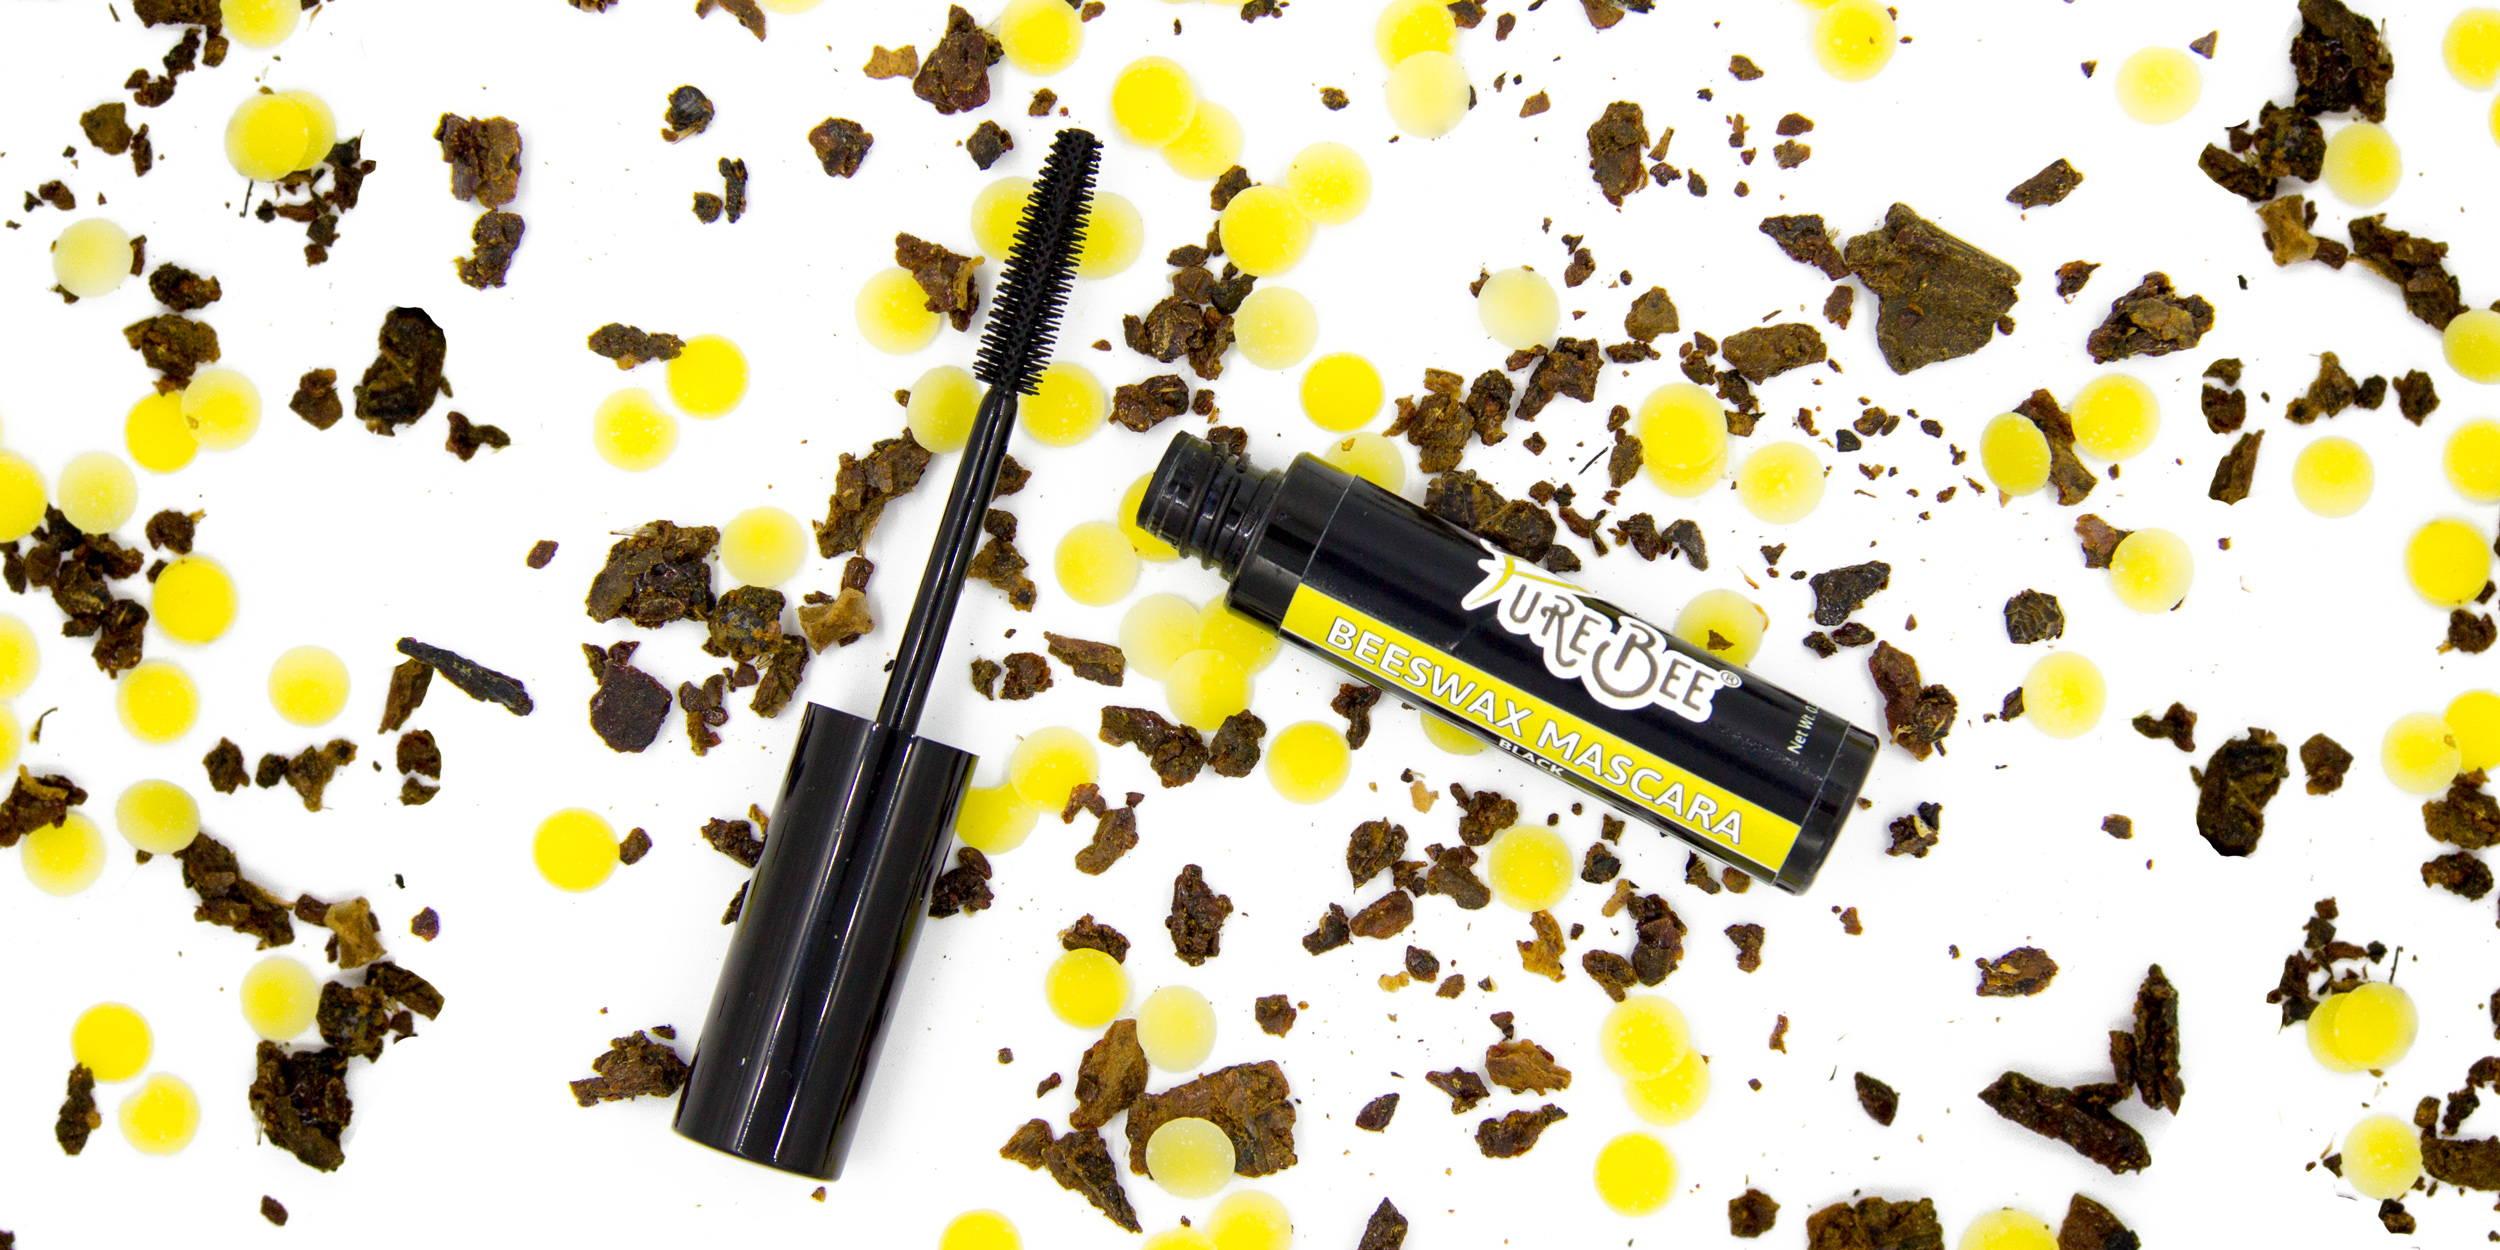 PureBee Beeswax Mascara open on beeswax and propolis